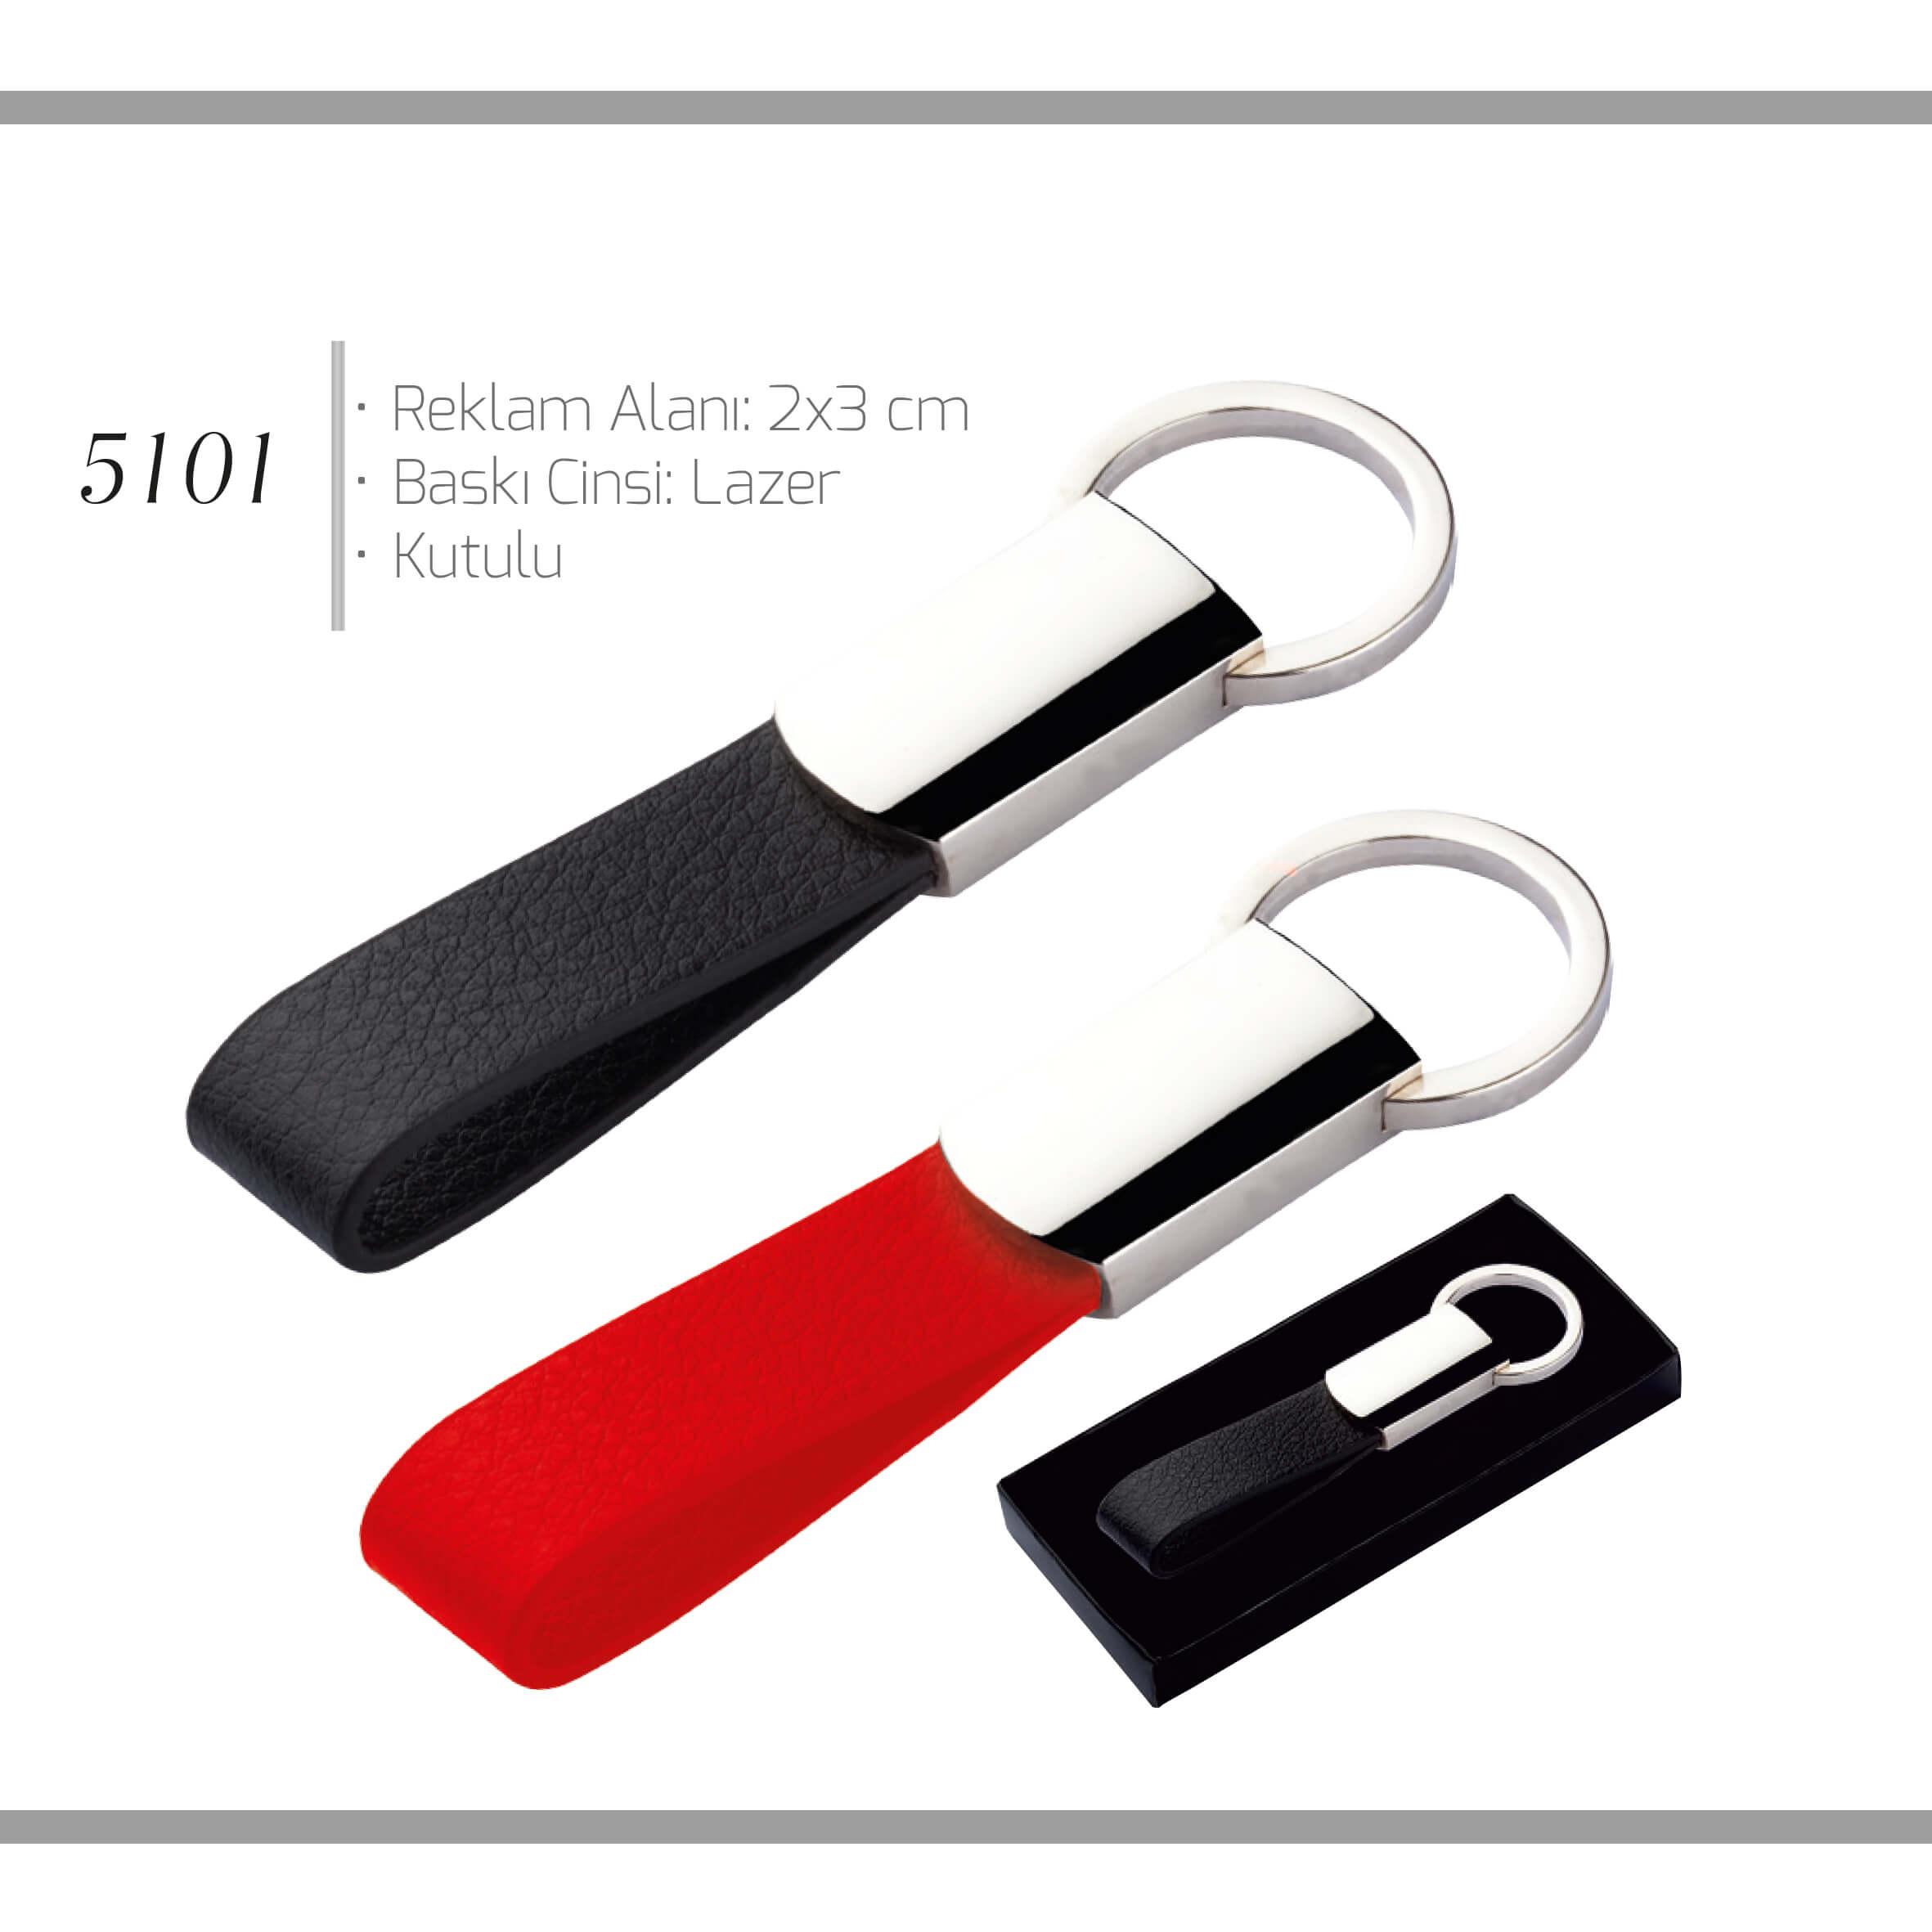 promosyon-promosyon ürünleri-anahtarlıklar-promosyon anahtarlık 5101